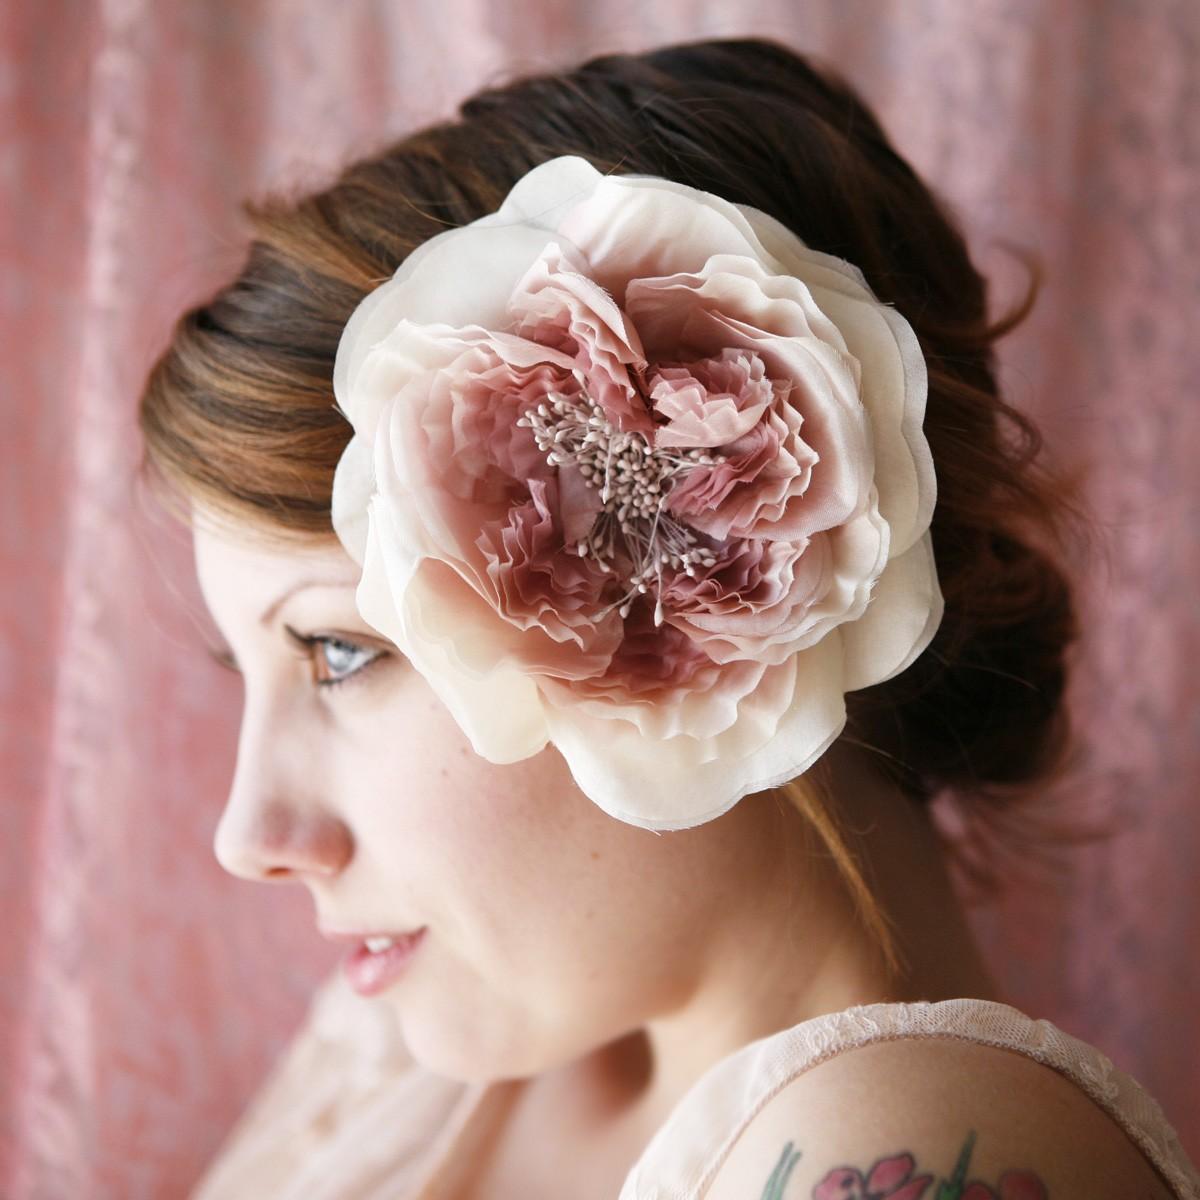 http://4.bp.blogspot.com/-BssLID1kSrA/TWVGMEZ84TI/AAAAAAAADw0/x1Rt3Nmzrlo/s1600/by+starlight+-+large+rose+clip.jpg